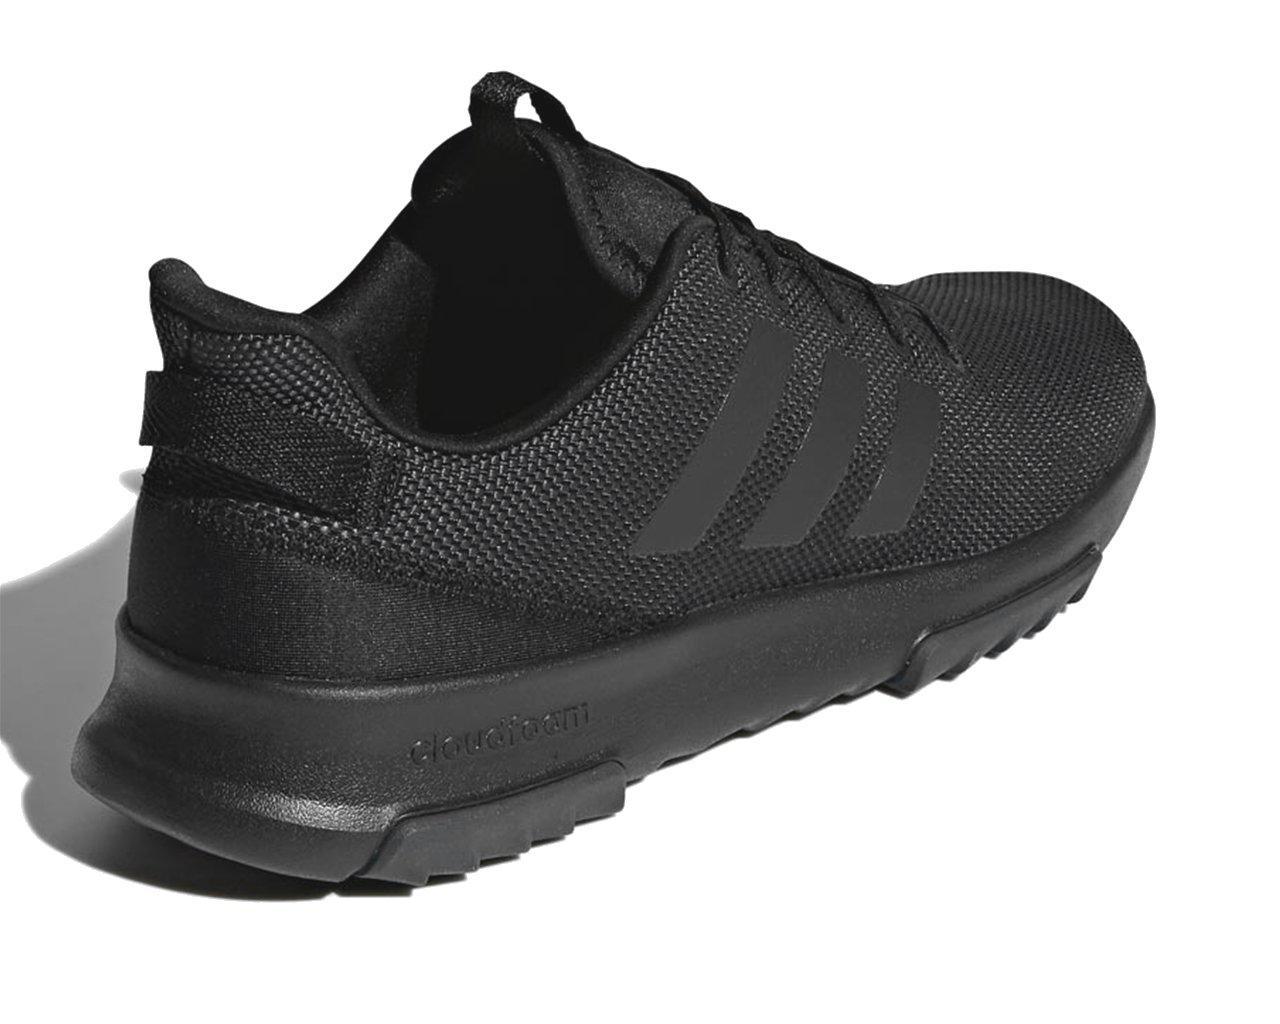 adidas Cloud Foam Racer Tr Trainers Black for Men